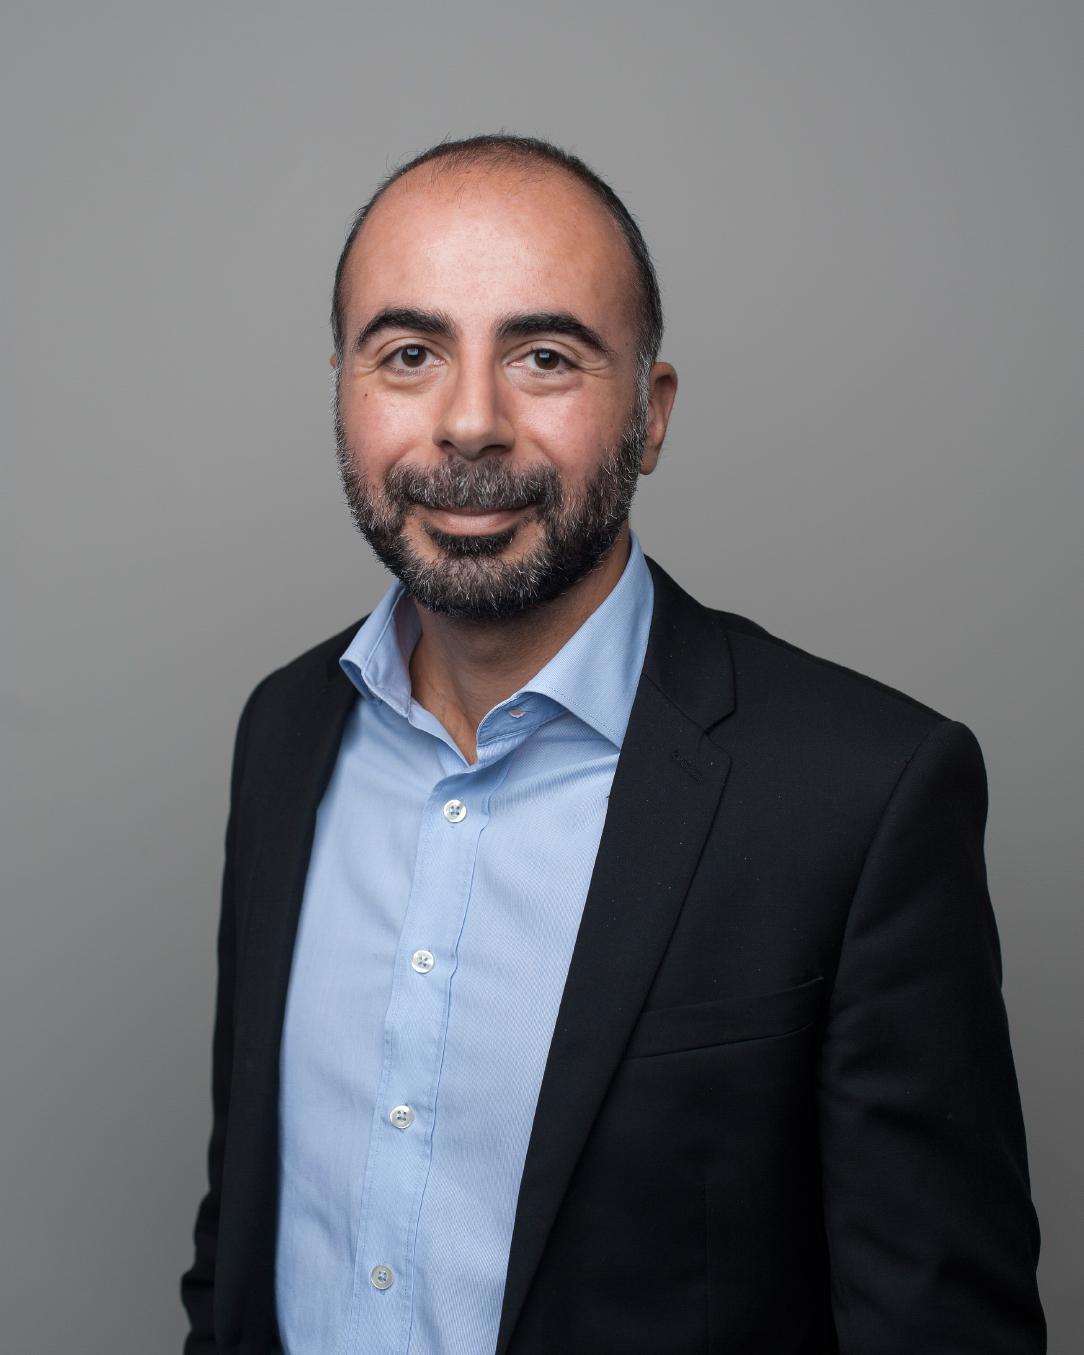 Olivier Moussa